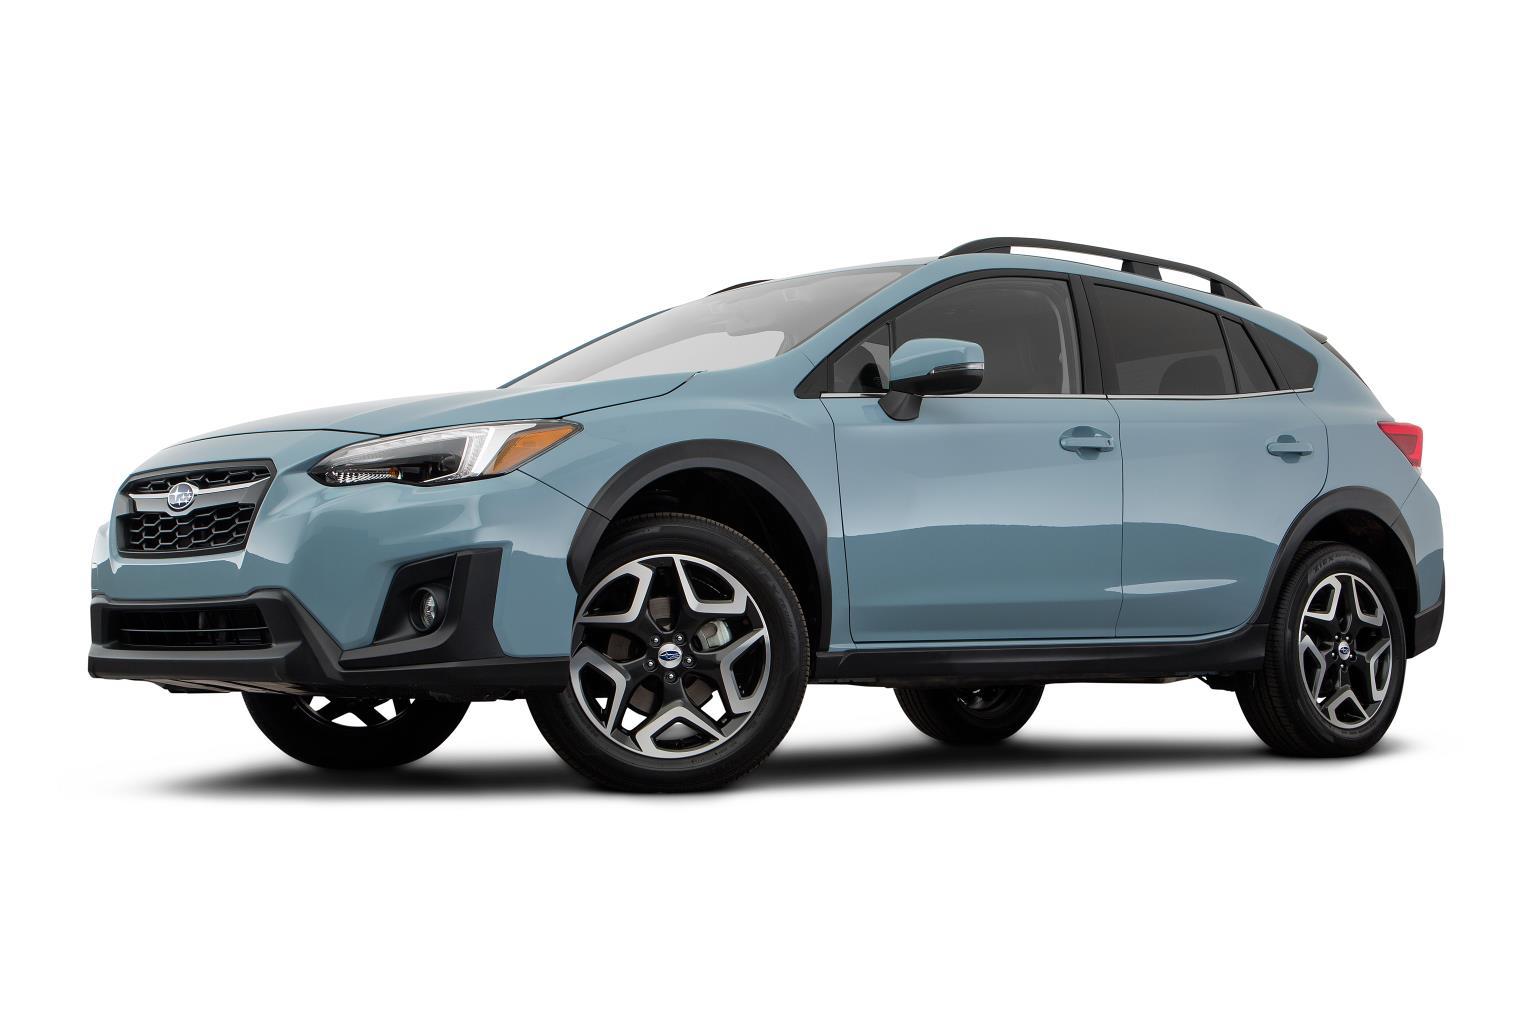 2017 Subaru Crosstrek 2.0i Premium >> SUBARU ANNOUNCES PRICING ON ALL-NEW 2018 CROSSTREK MODELS - myAutoWorld.com